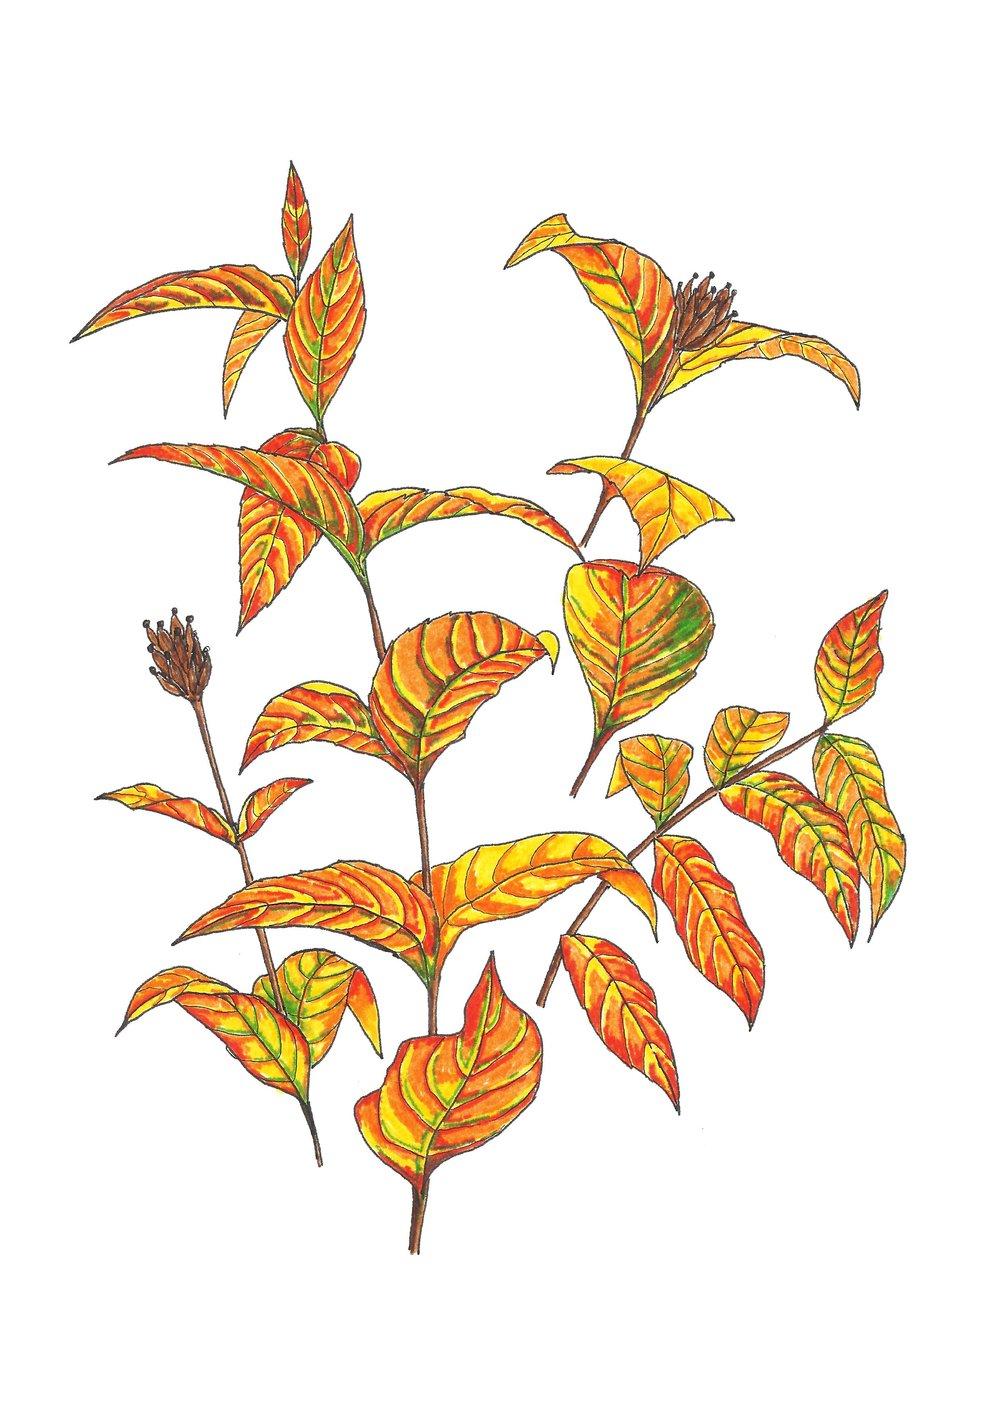 Autumn series no.10.jpg